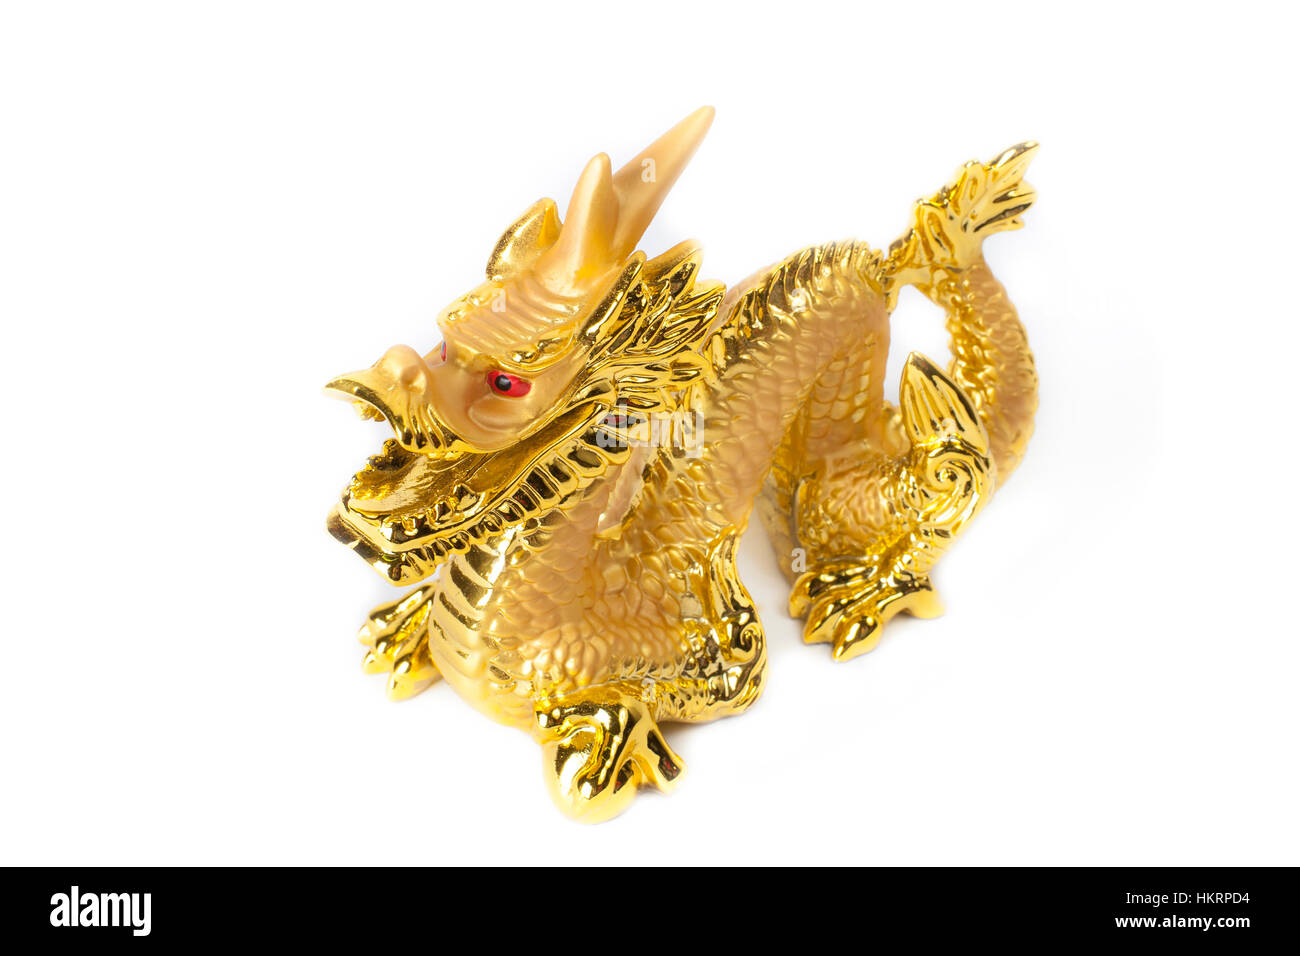 golden dragon china stock photos golden dragon china stock images alamy. Black Bedroom Furniture Sets. Home Design Ideas